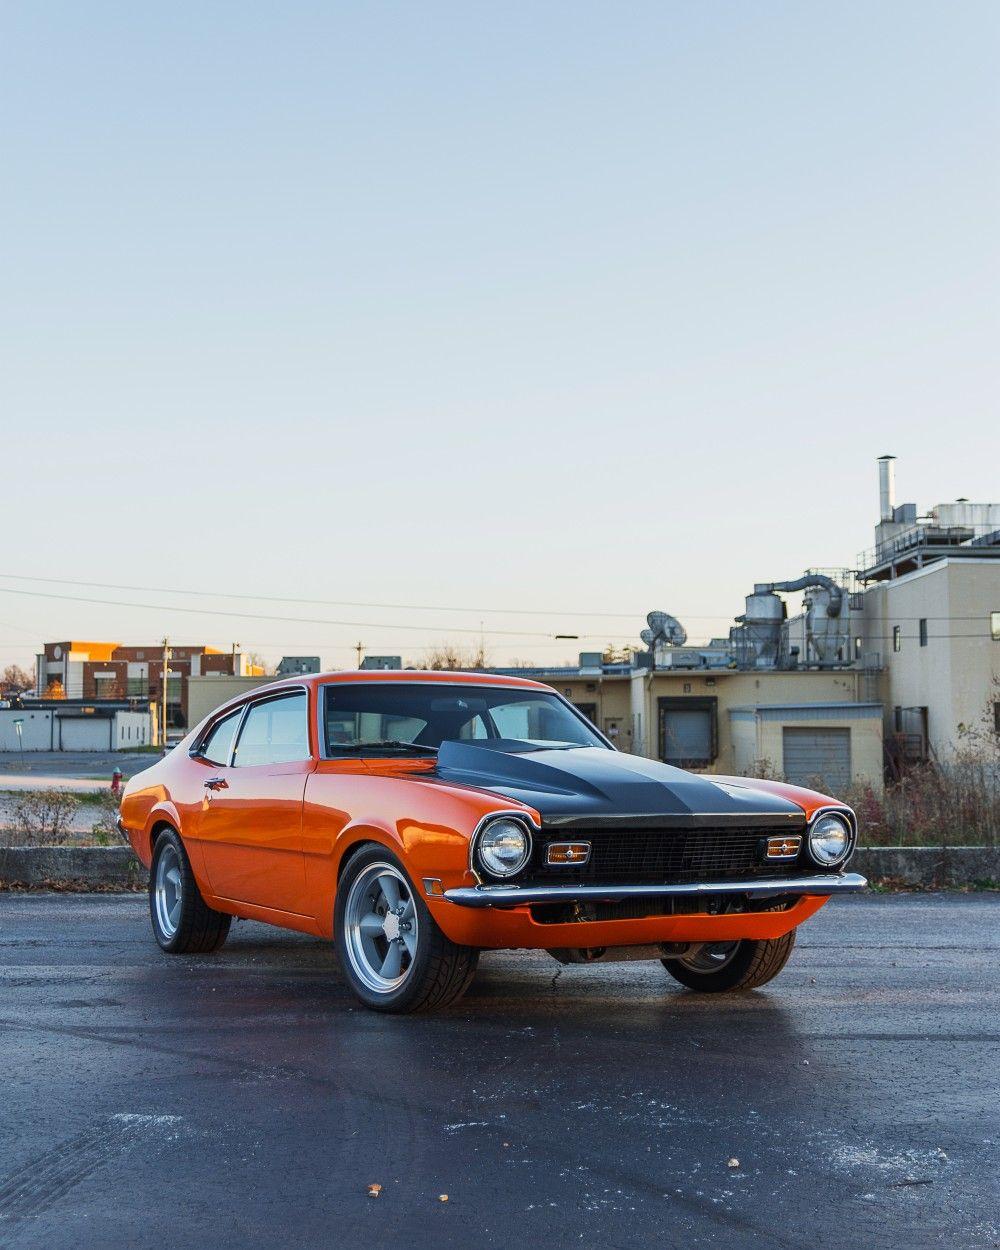 Ford Maverick | Ford maverick, Dream cars, Ford fairlane